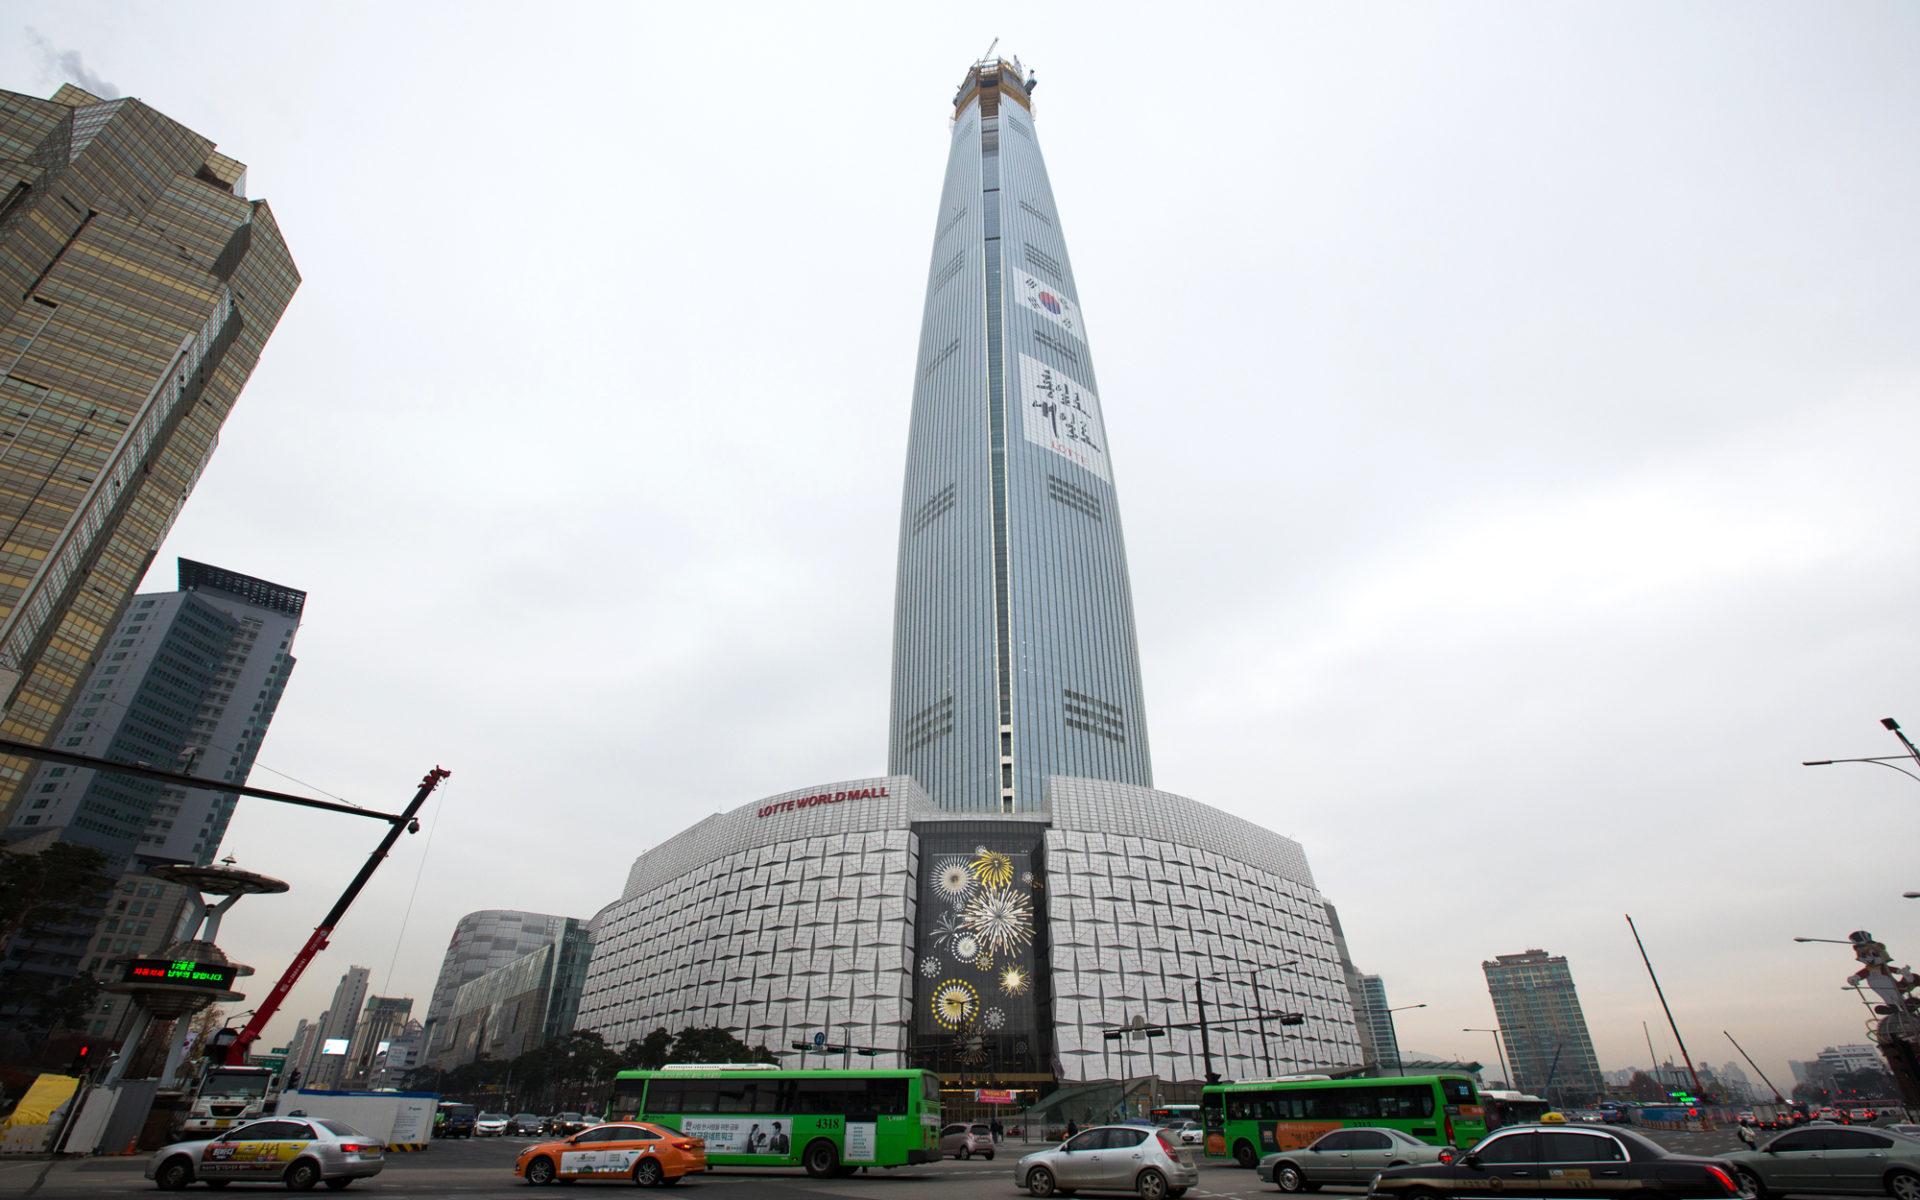 16. Lotte World Tower (Сеул, Южная Корея) - 498 метров.